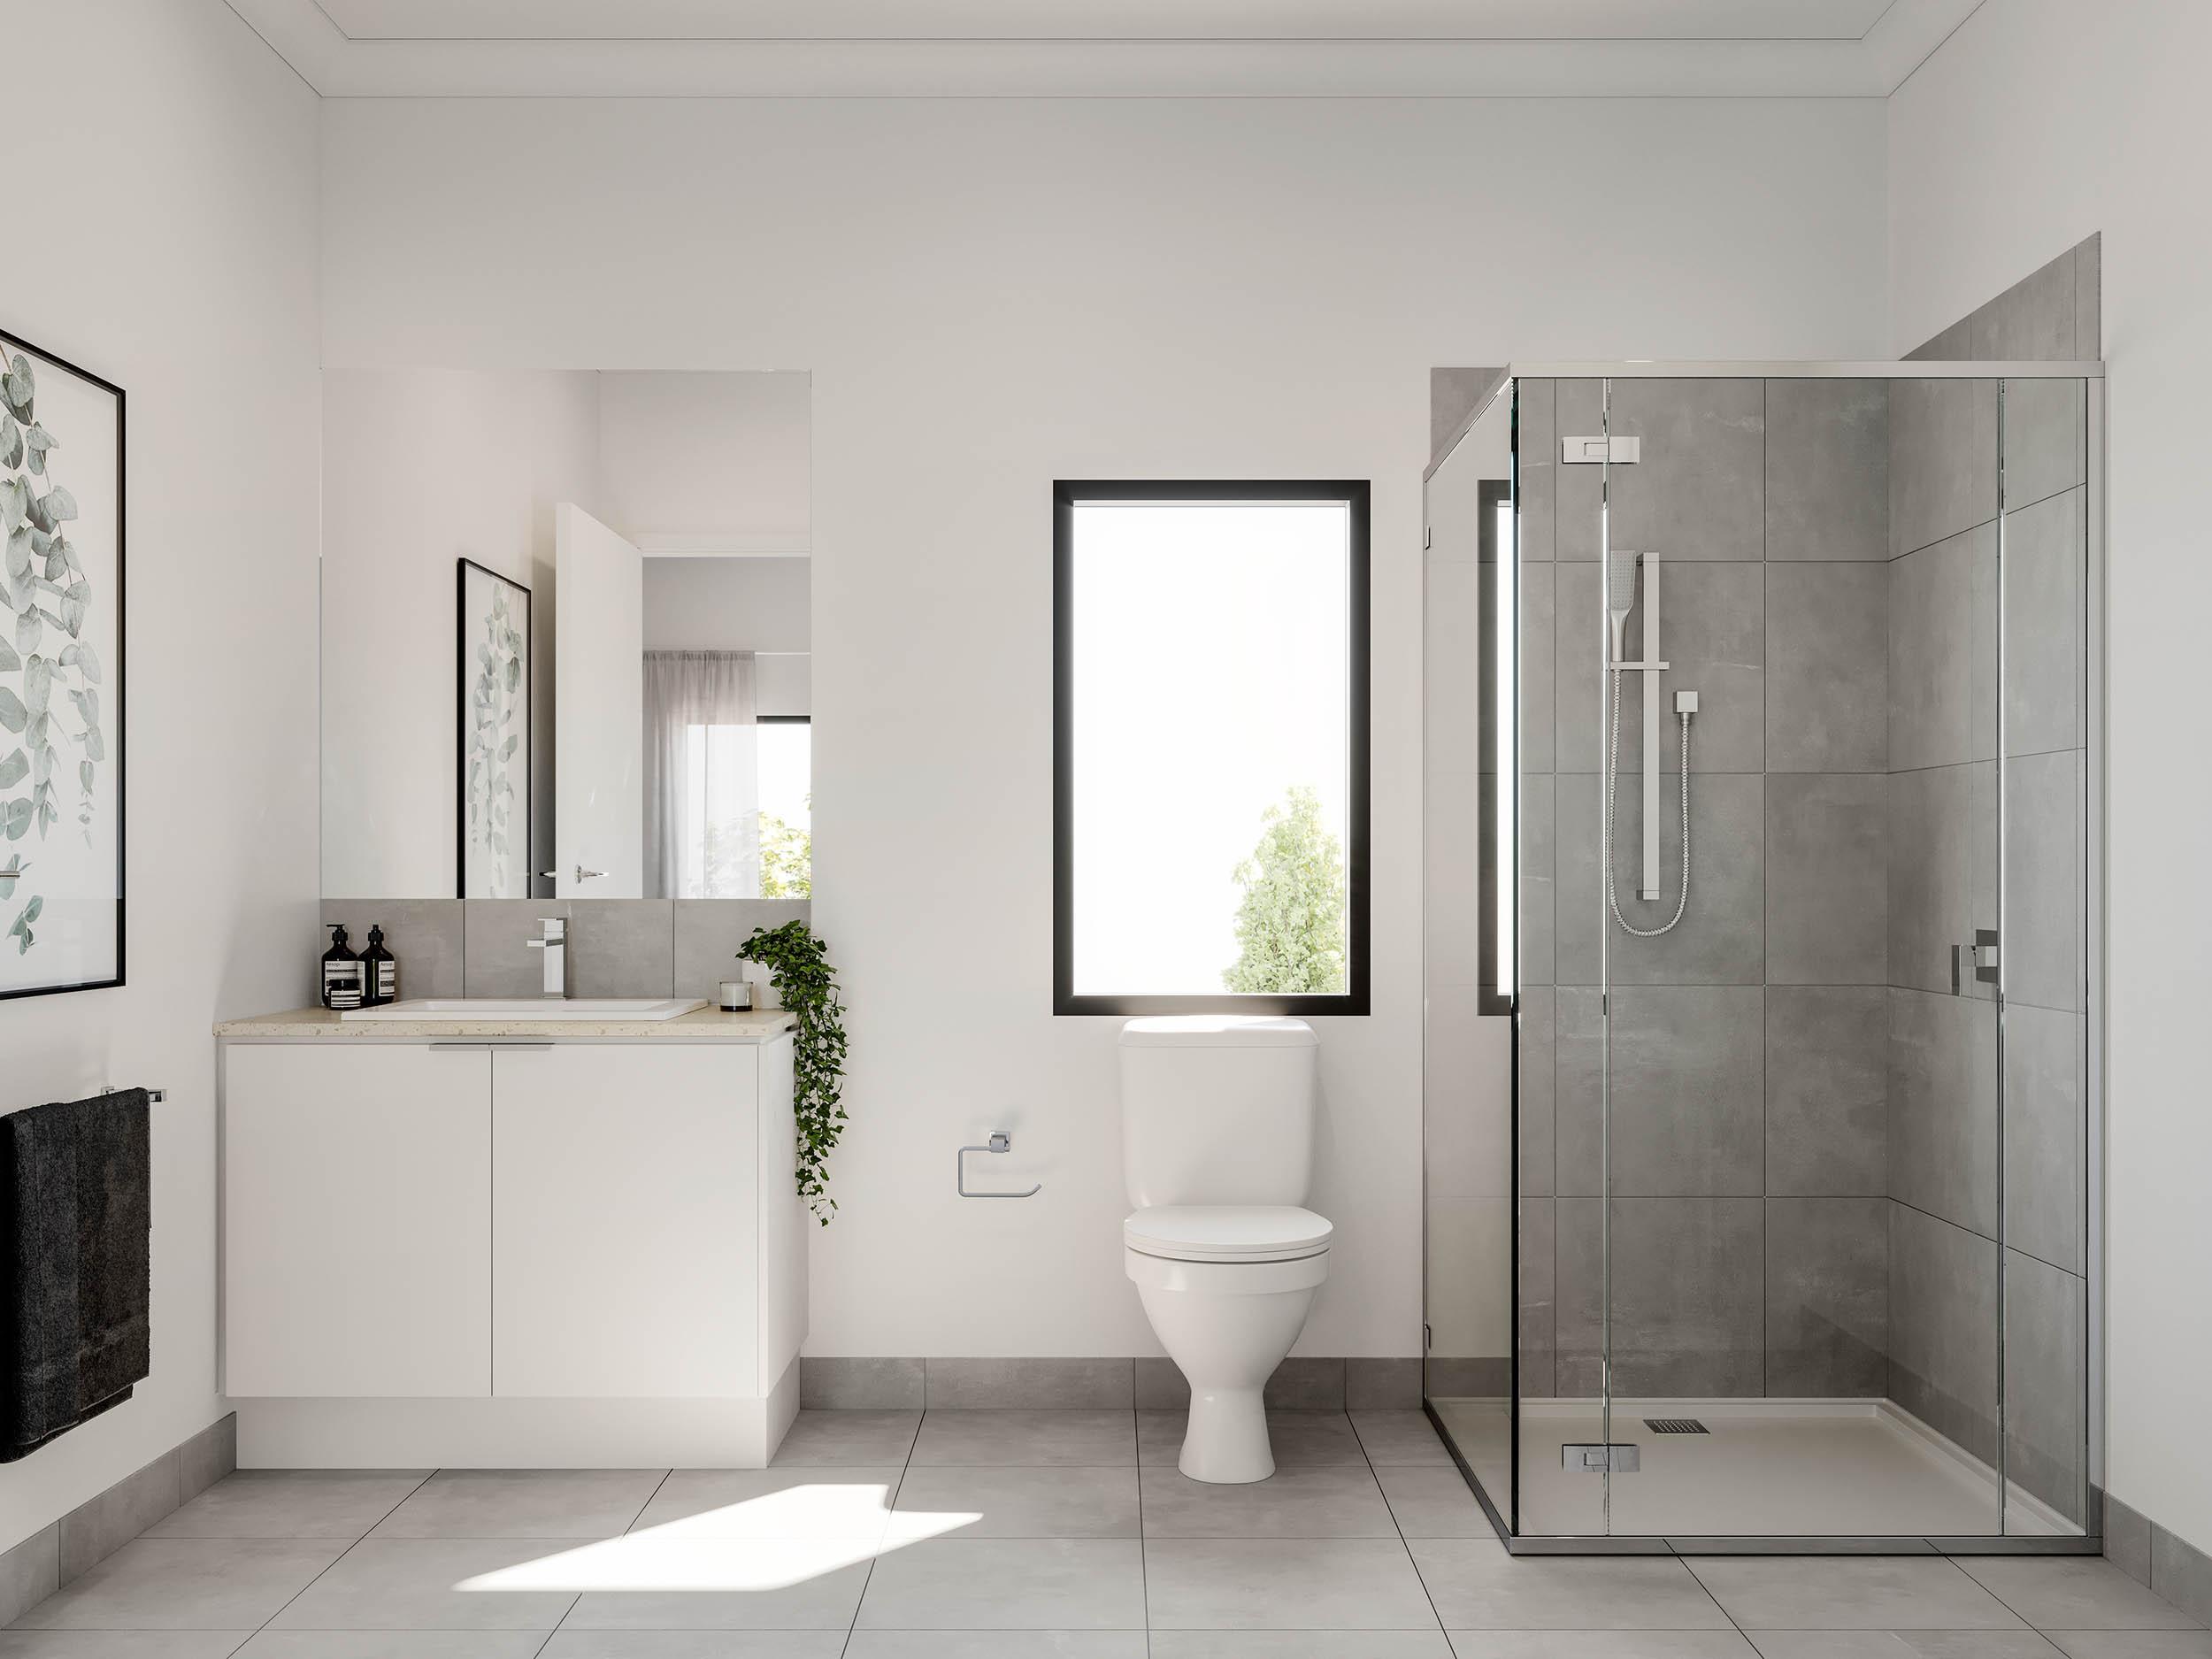 Tips for Stylish Home Renovation